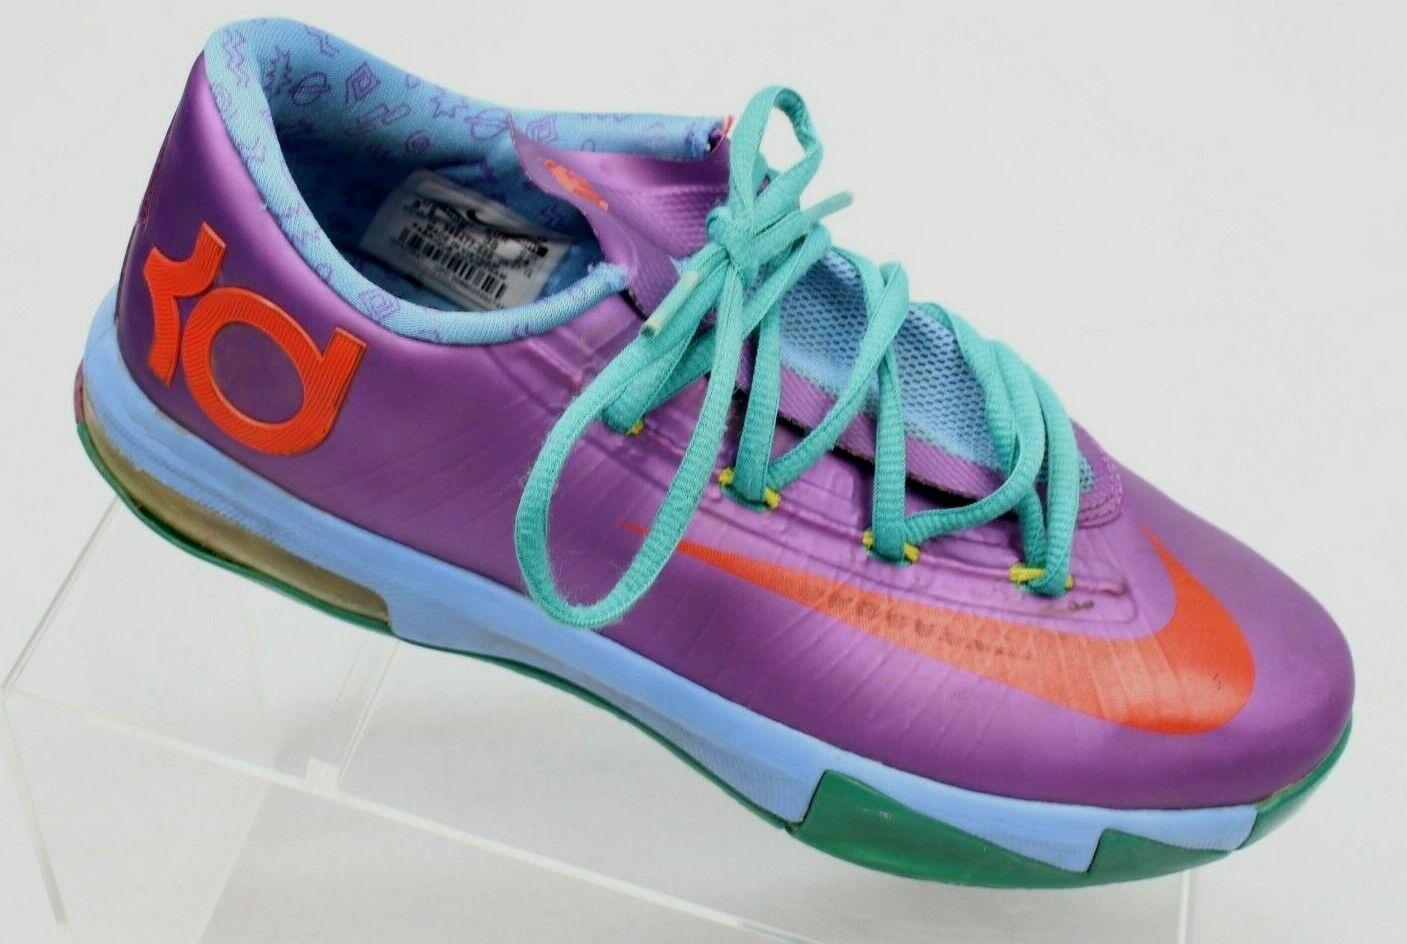 Nike KD Vl Rugrats 599477-500